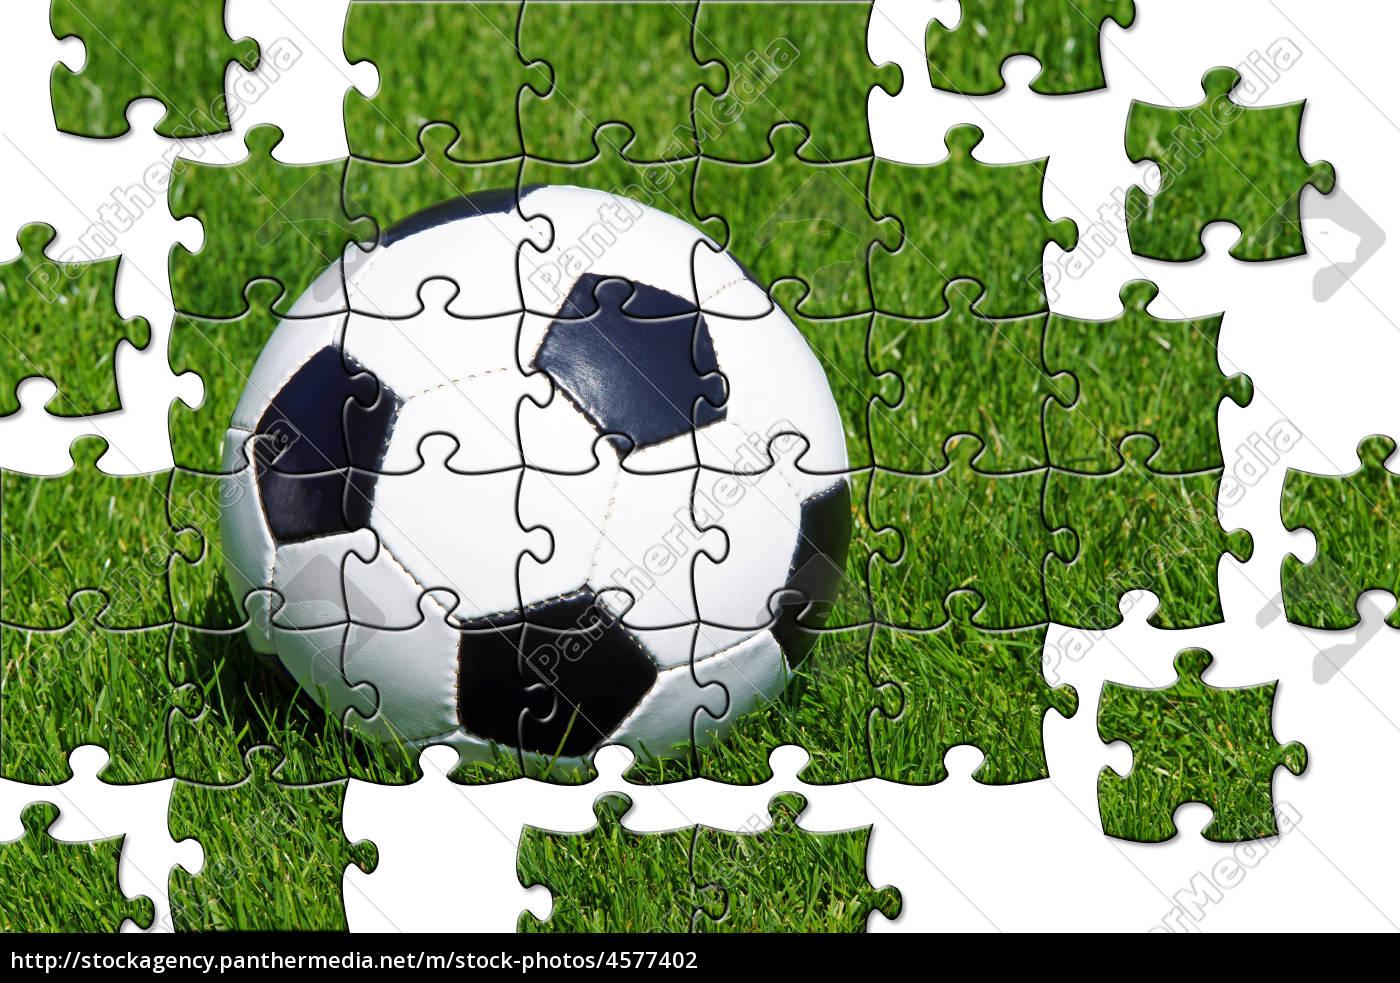 Stock Bild 4577402 Fussball Puzzle